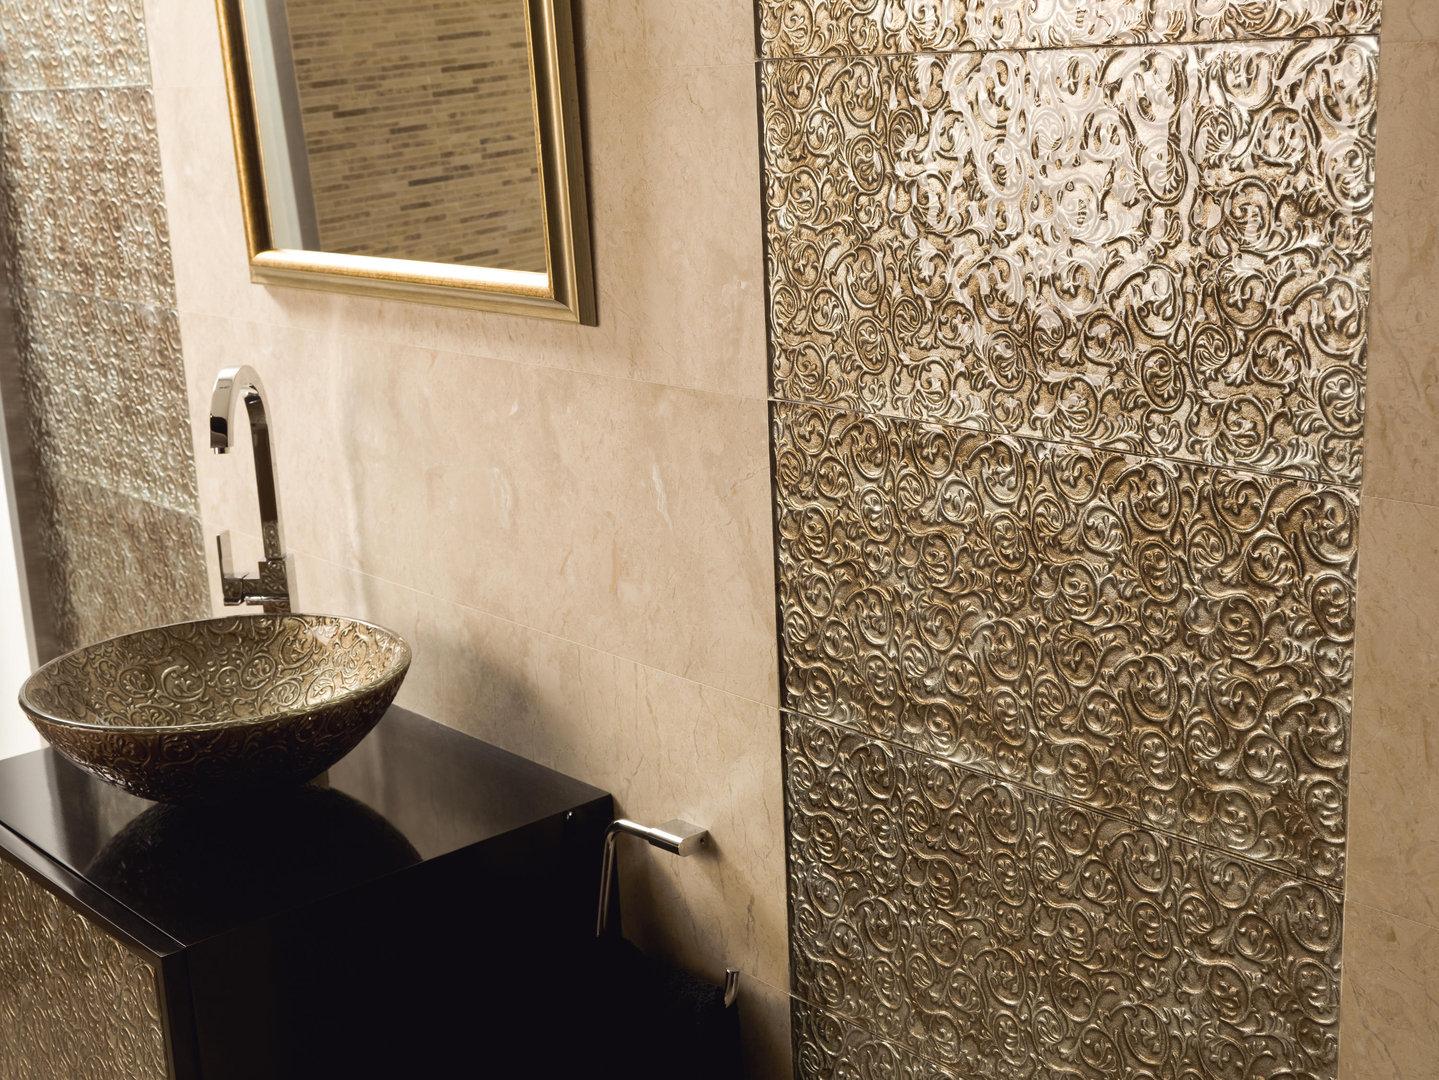 Wandfliese Dune Venezia Kupfer Glanzend 30x60cm Online Kaufen